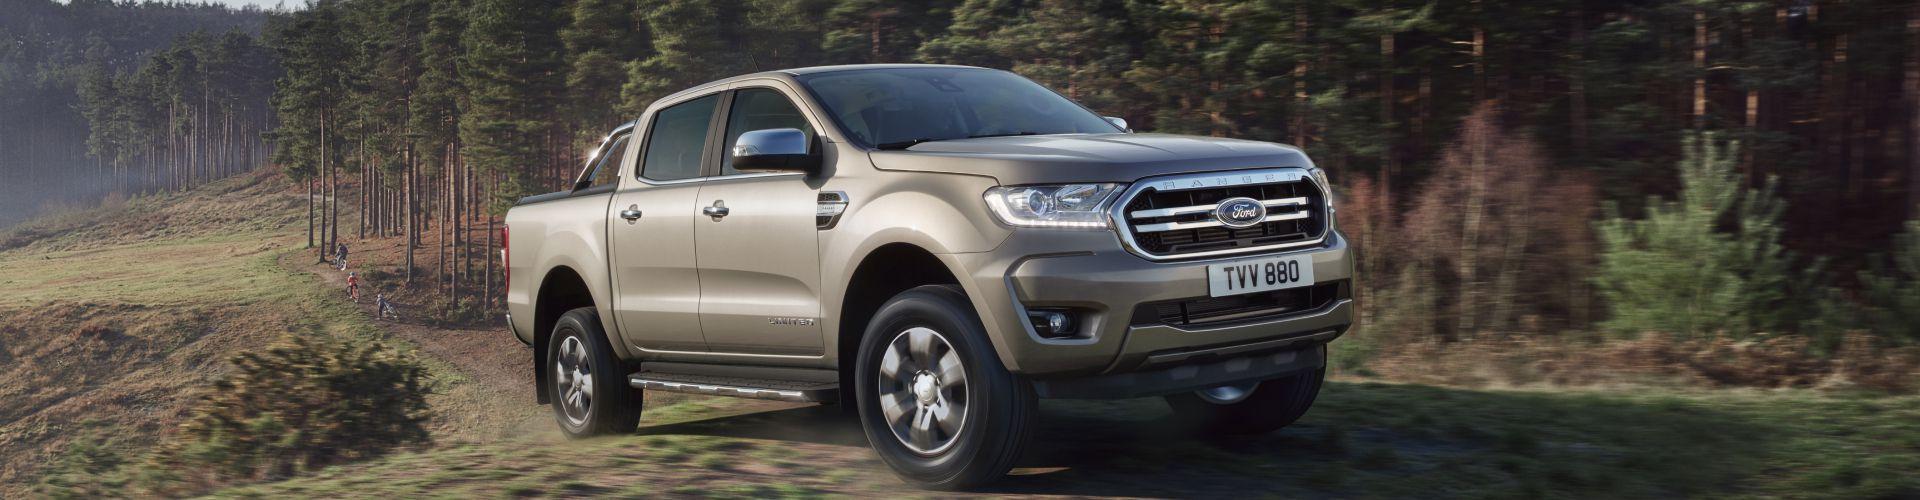 Ford Ranger - A. Λιάπης Αντιπροσωπεία